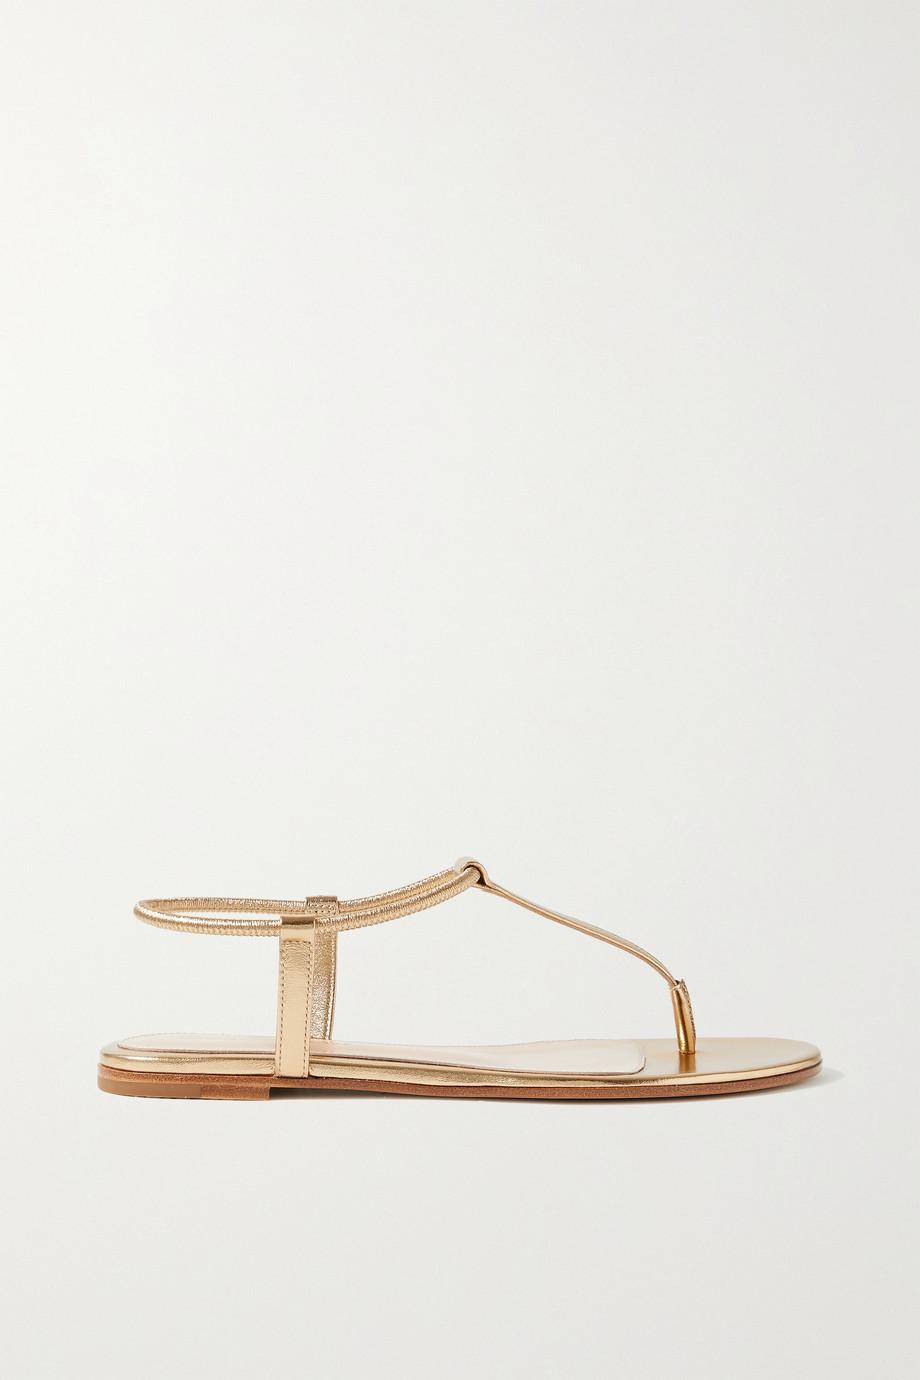 Gianvito Rossi Jaey metallic leather sandals